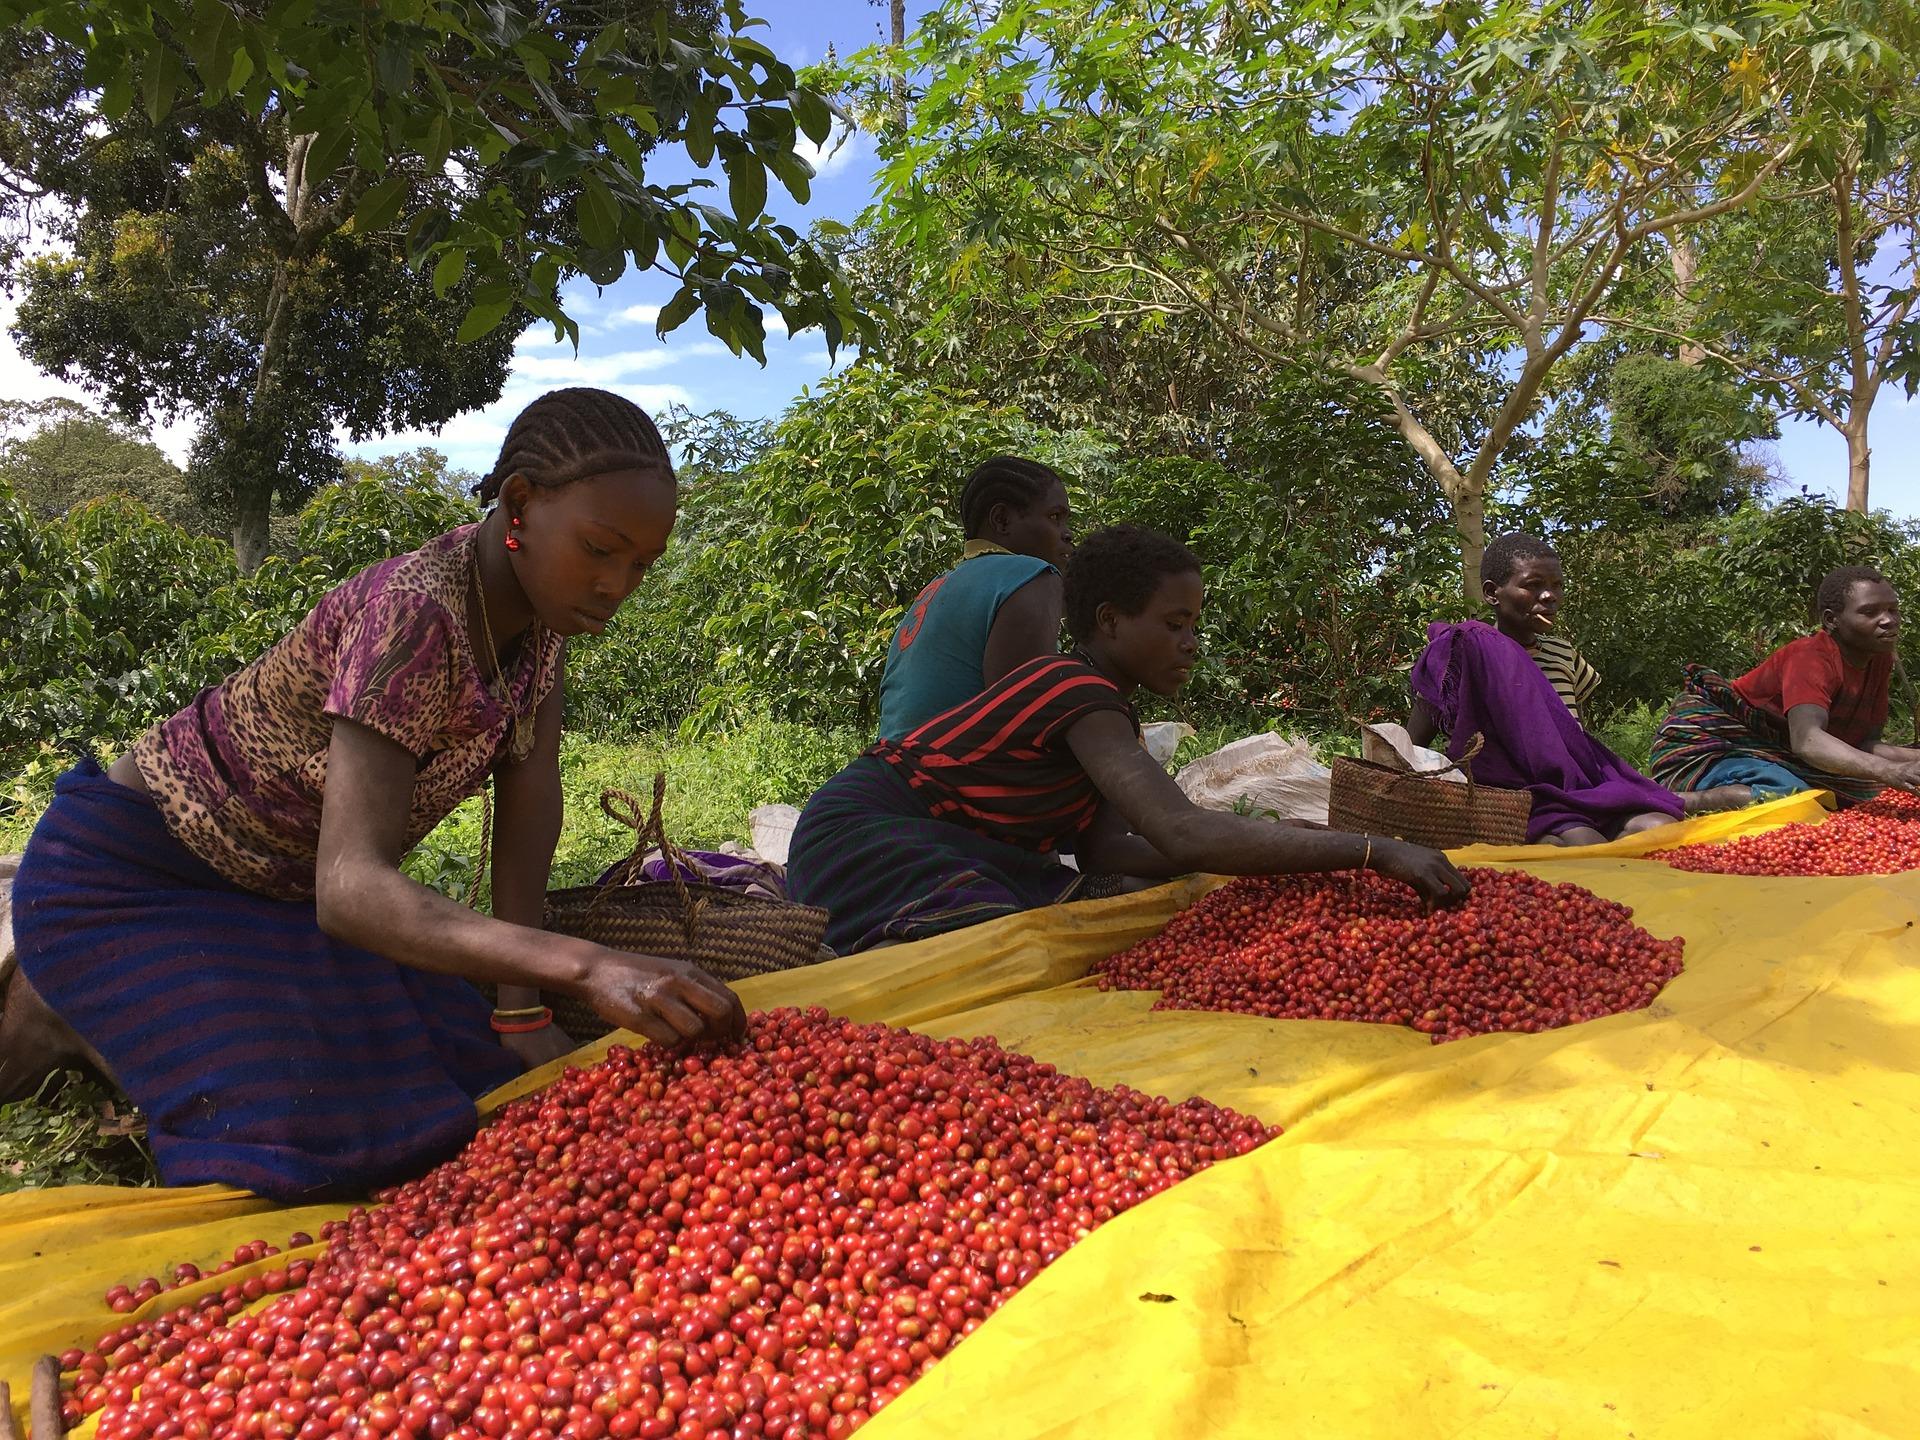 Coffee bean farmers picking through the coffee tree fruit